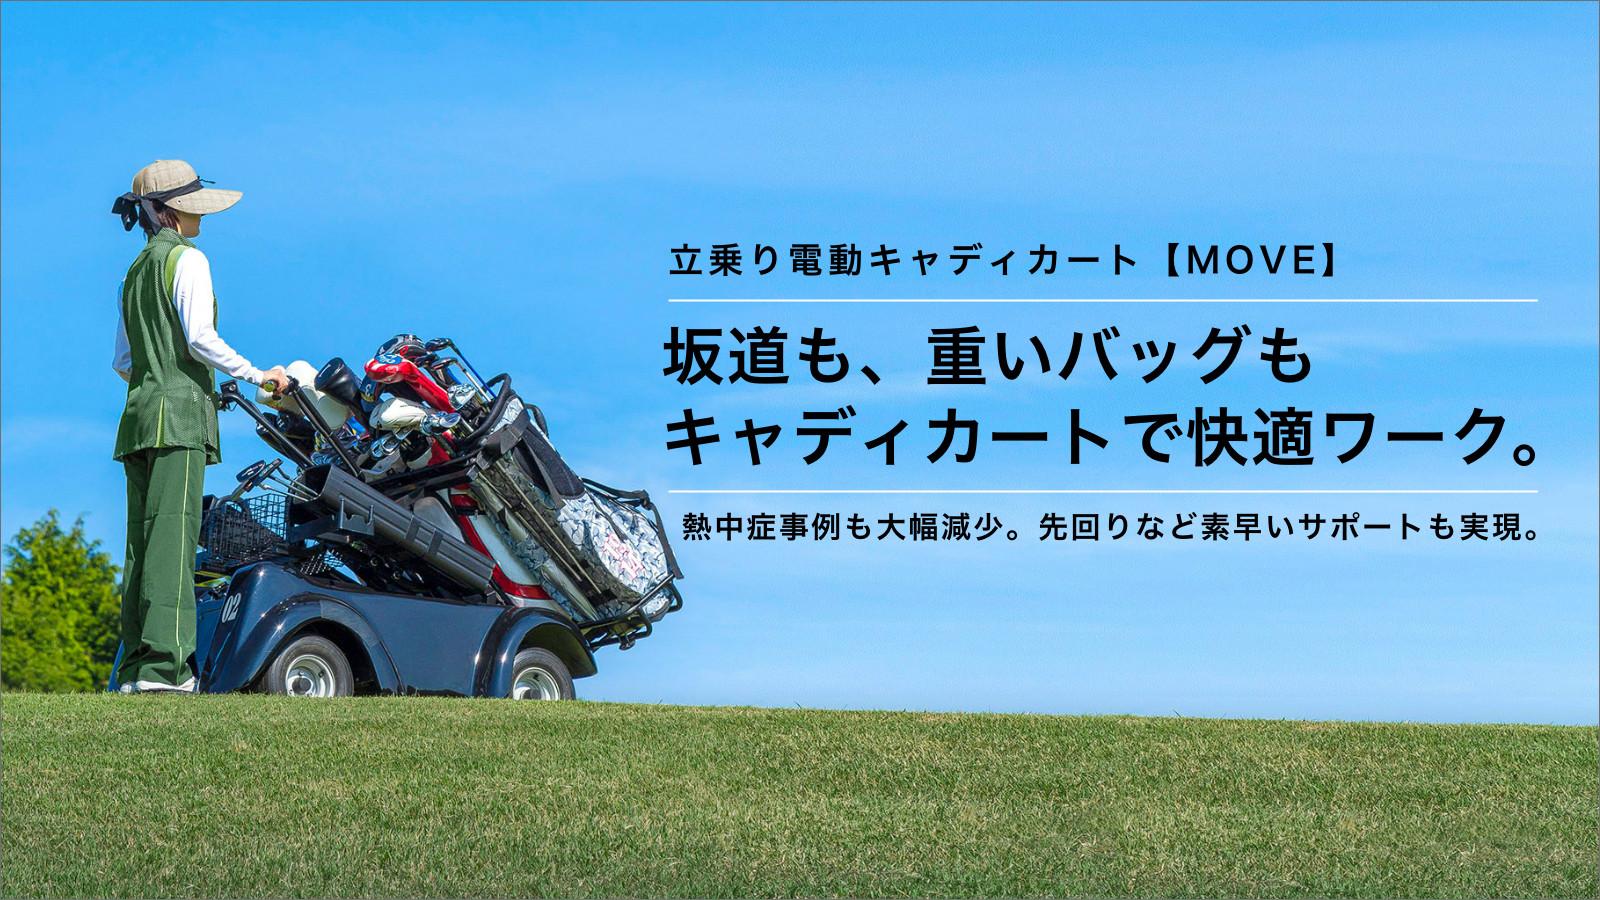 MOVE_TOP01.jpg